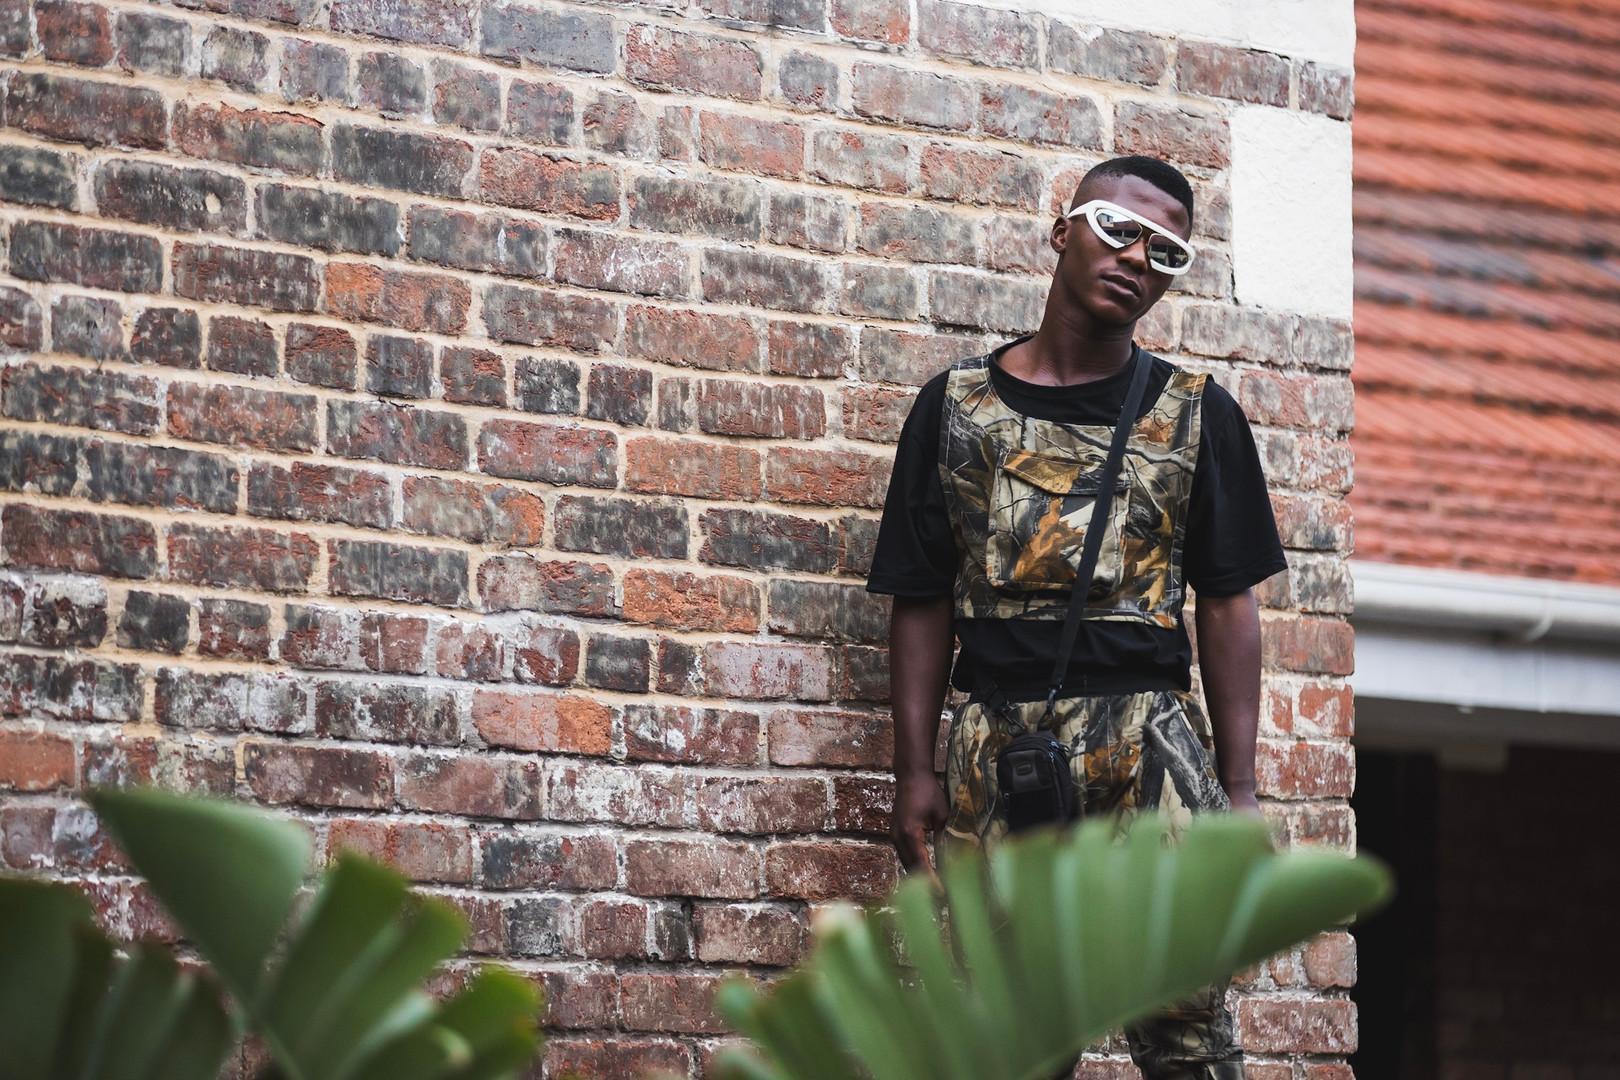 South Africa [fashion designer]